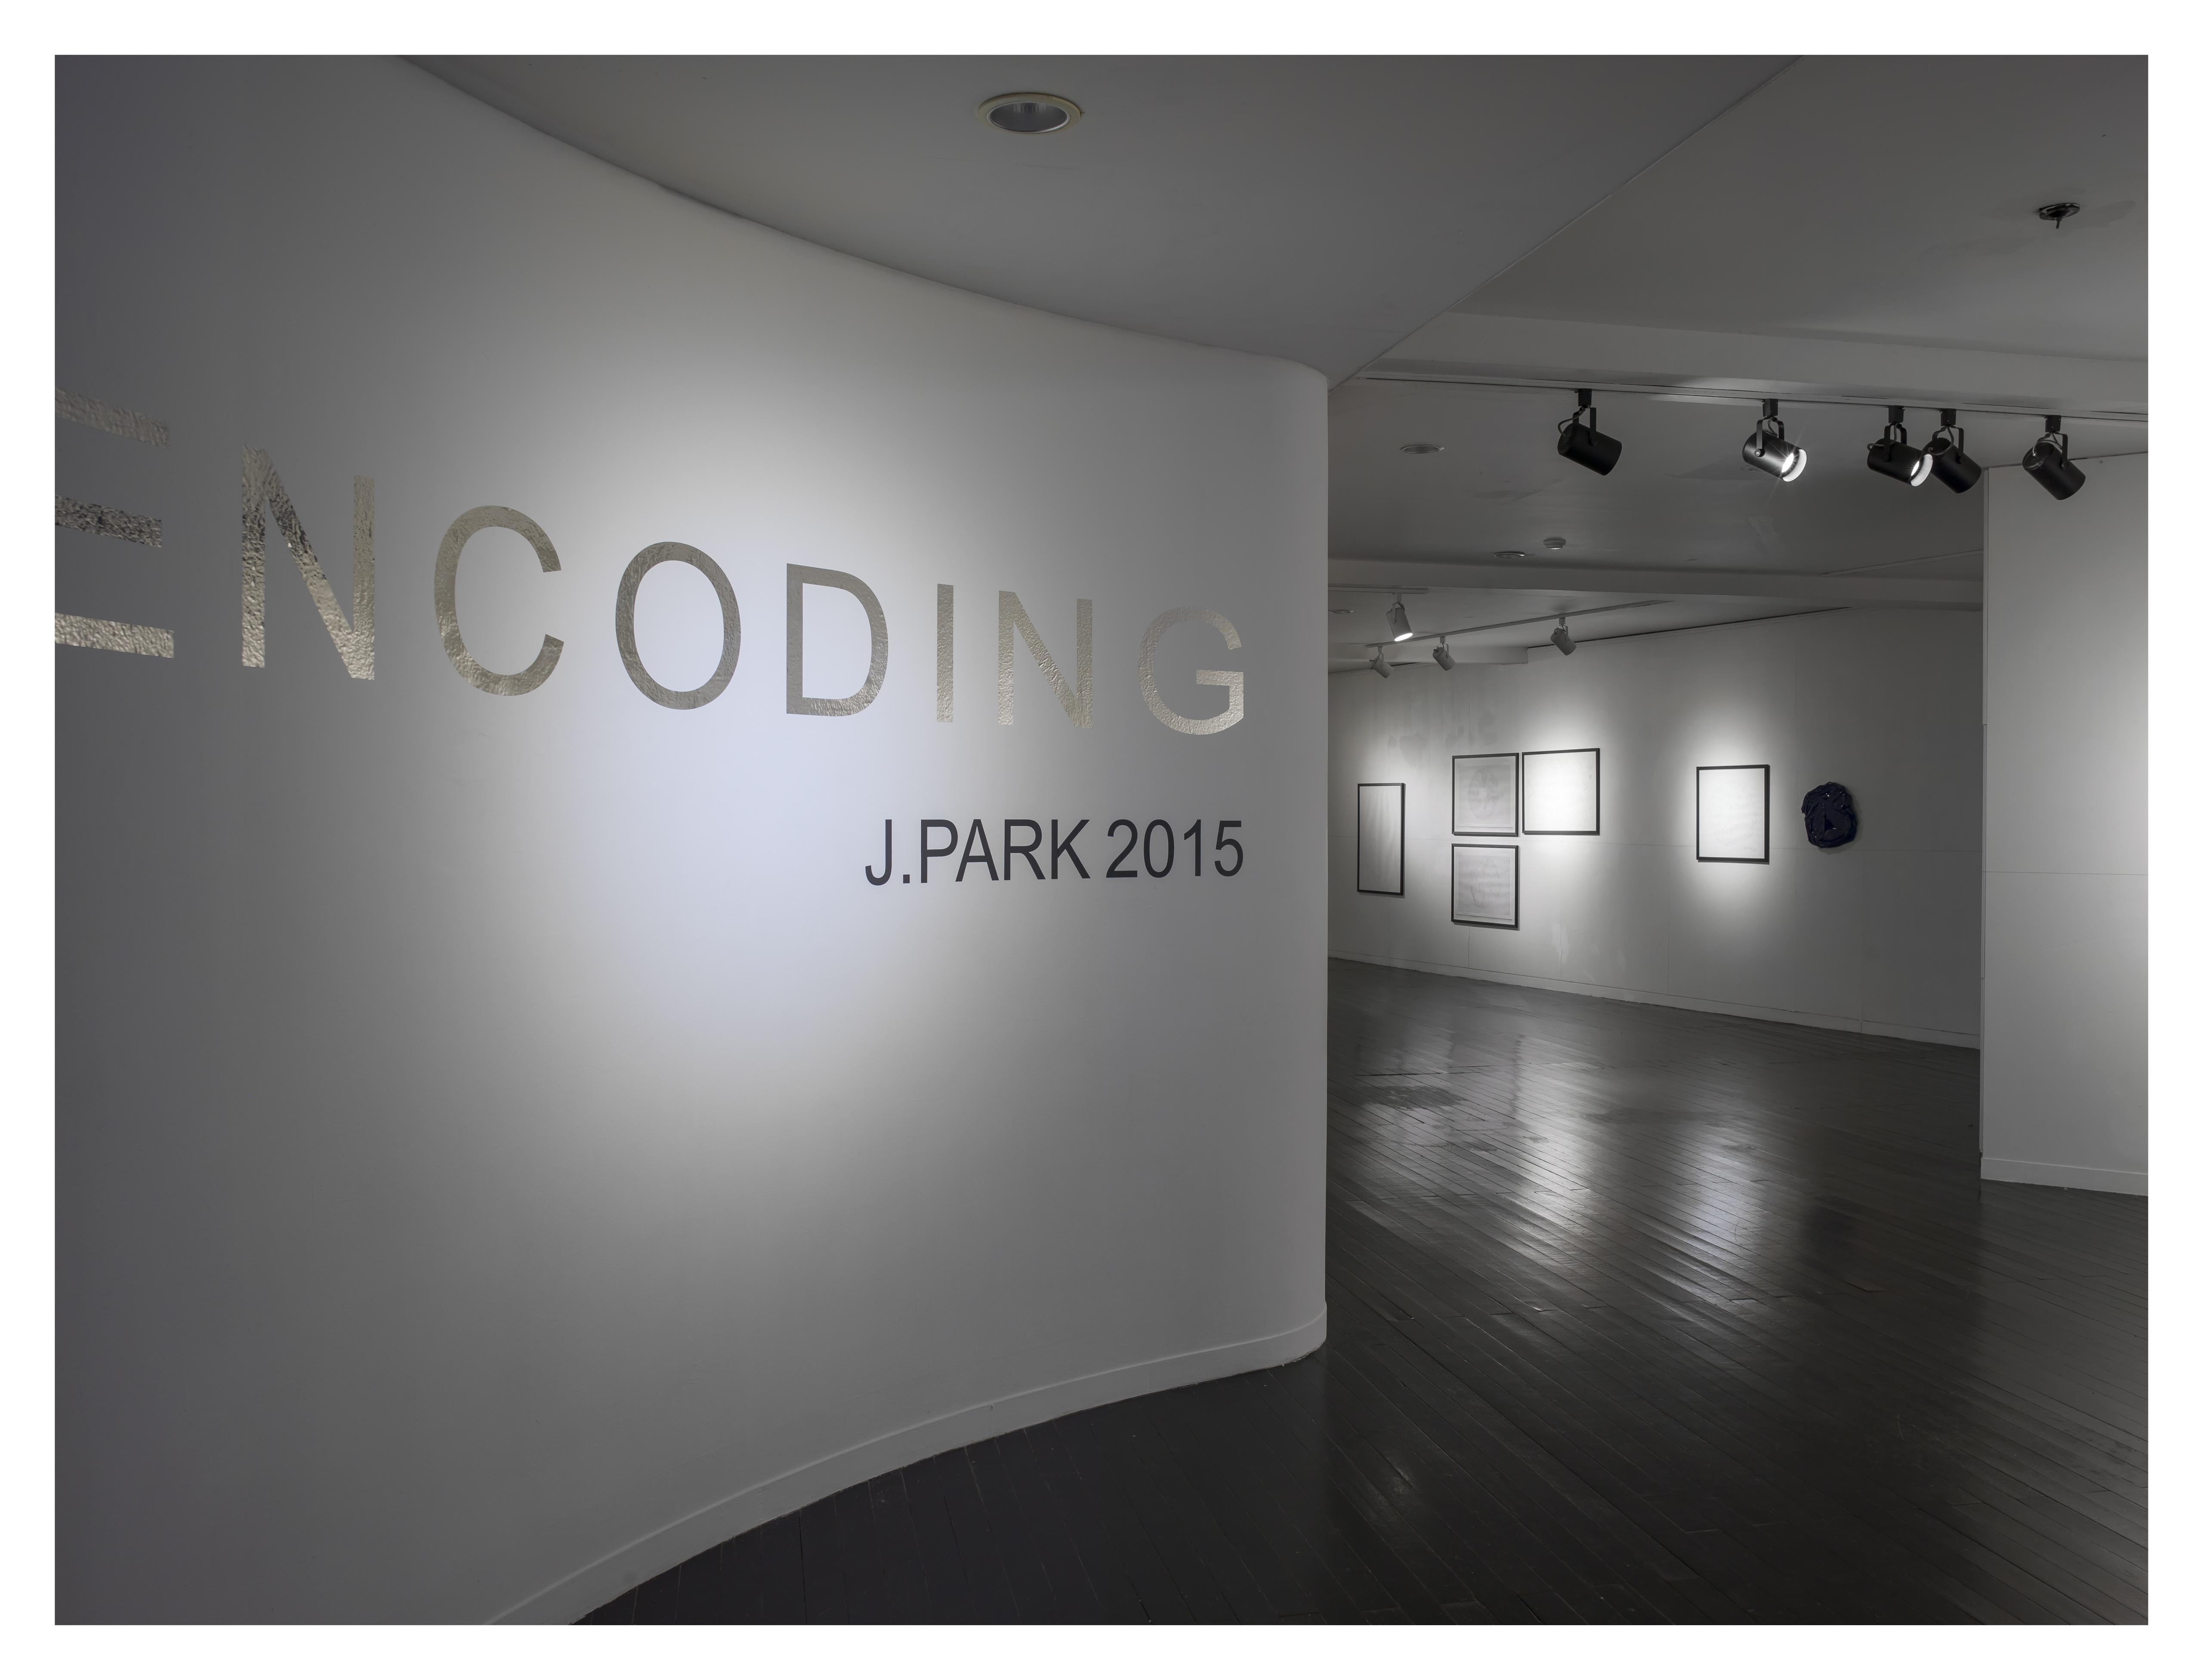 ENCODING 2015